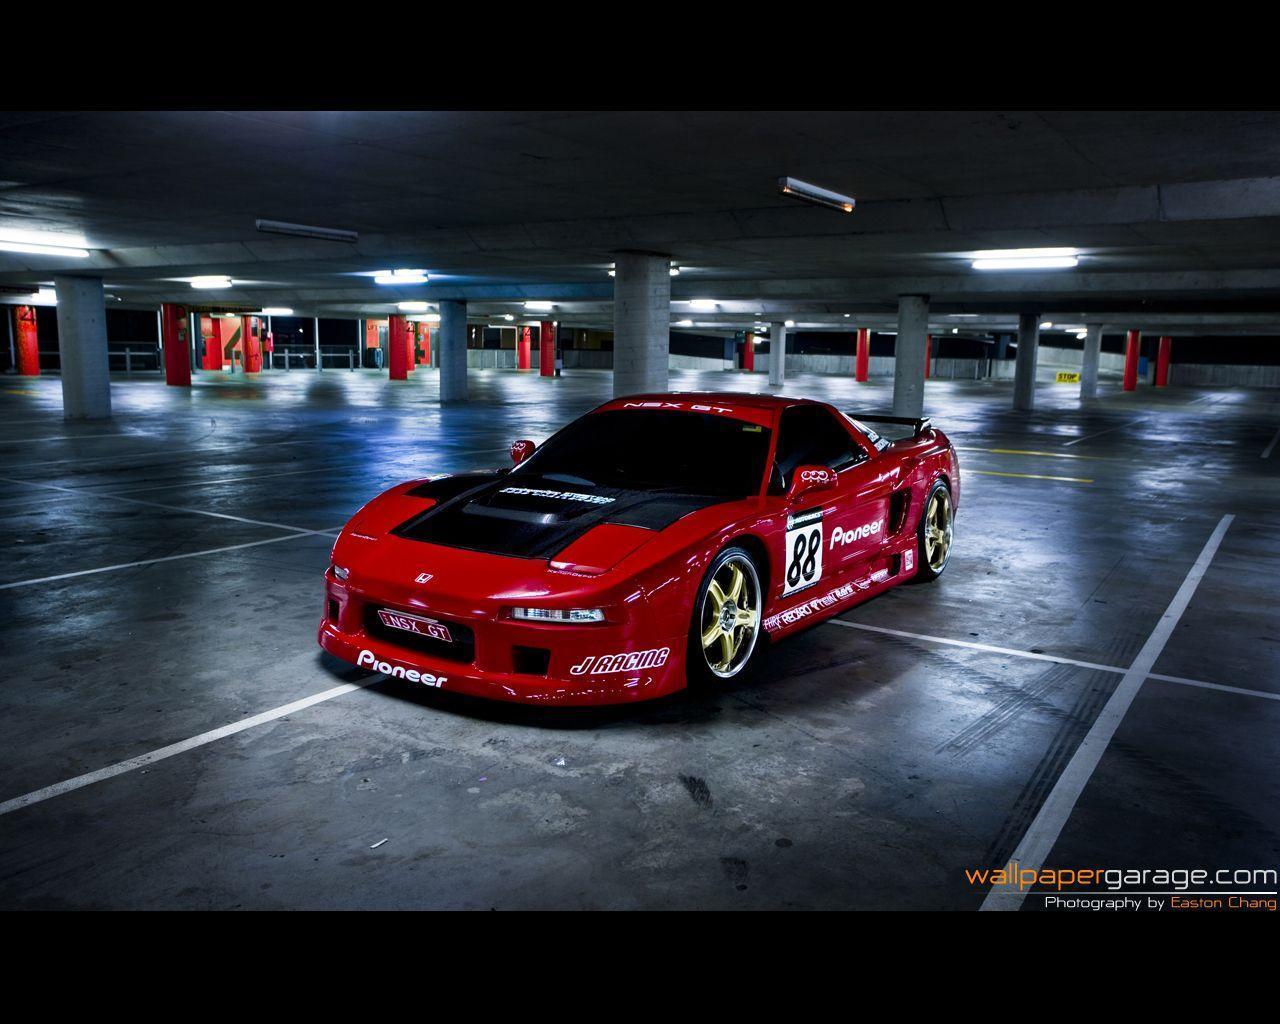 High Quality Honda NSX JDM Japanese Domestic Market Japanese Cars Vehicles .